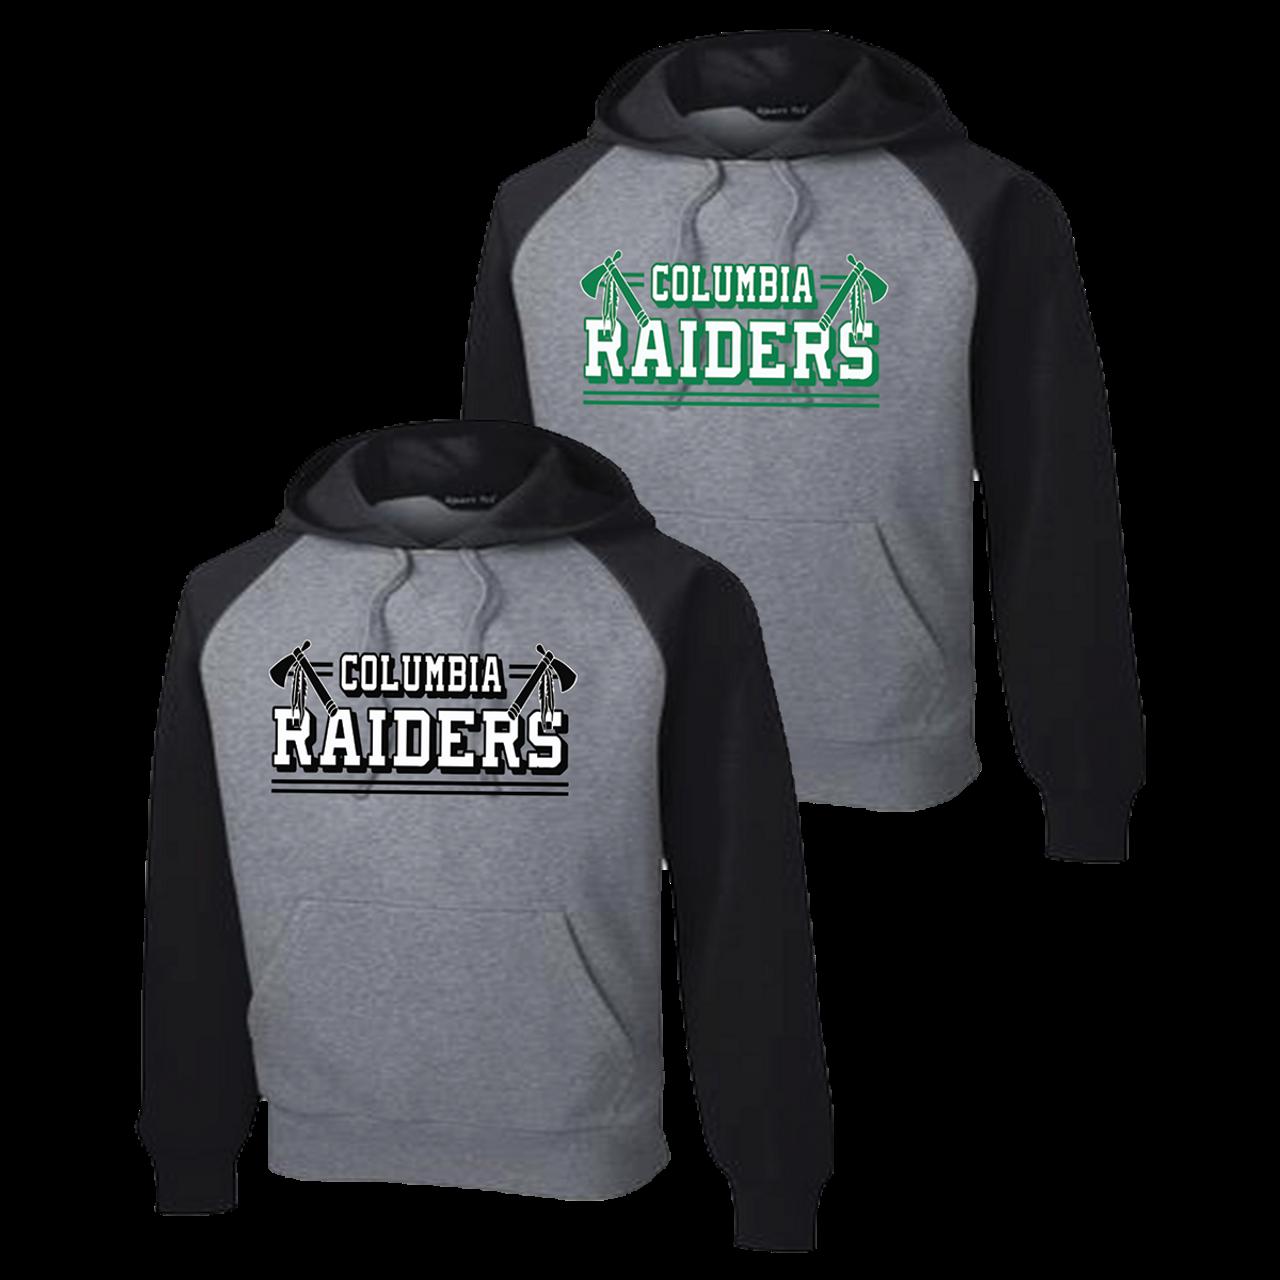 3d5503f05ebfa Columbia Raiders Colorblock Hoodie (F183 F184) - RycoSports